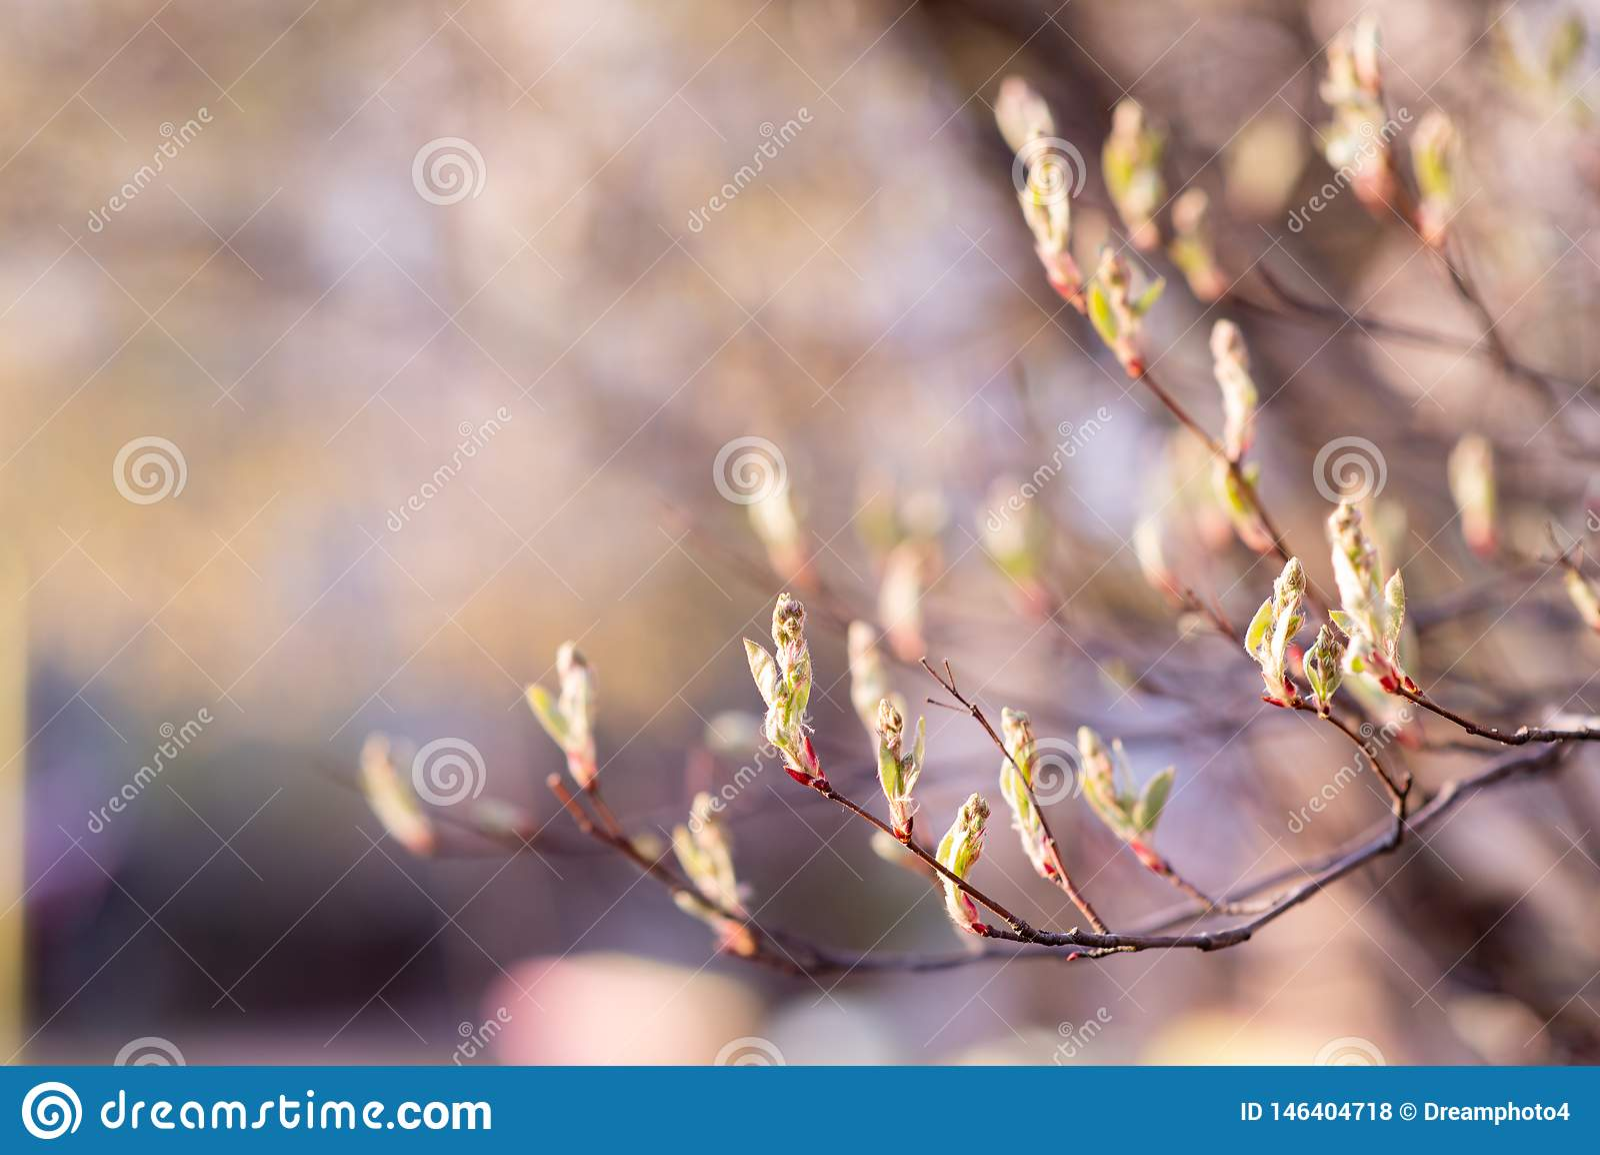 Branche de ressort avec de jeunes feuilles